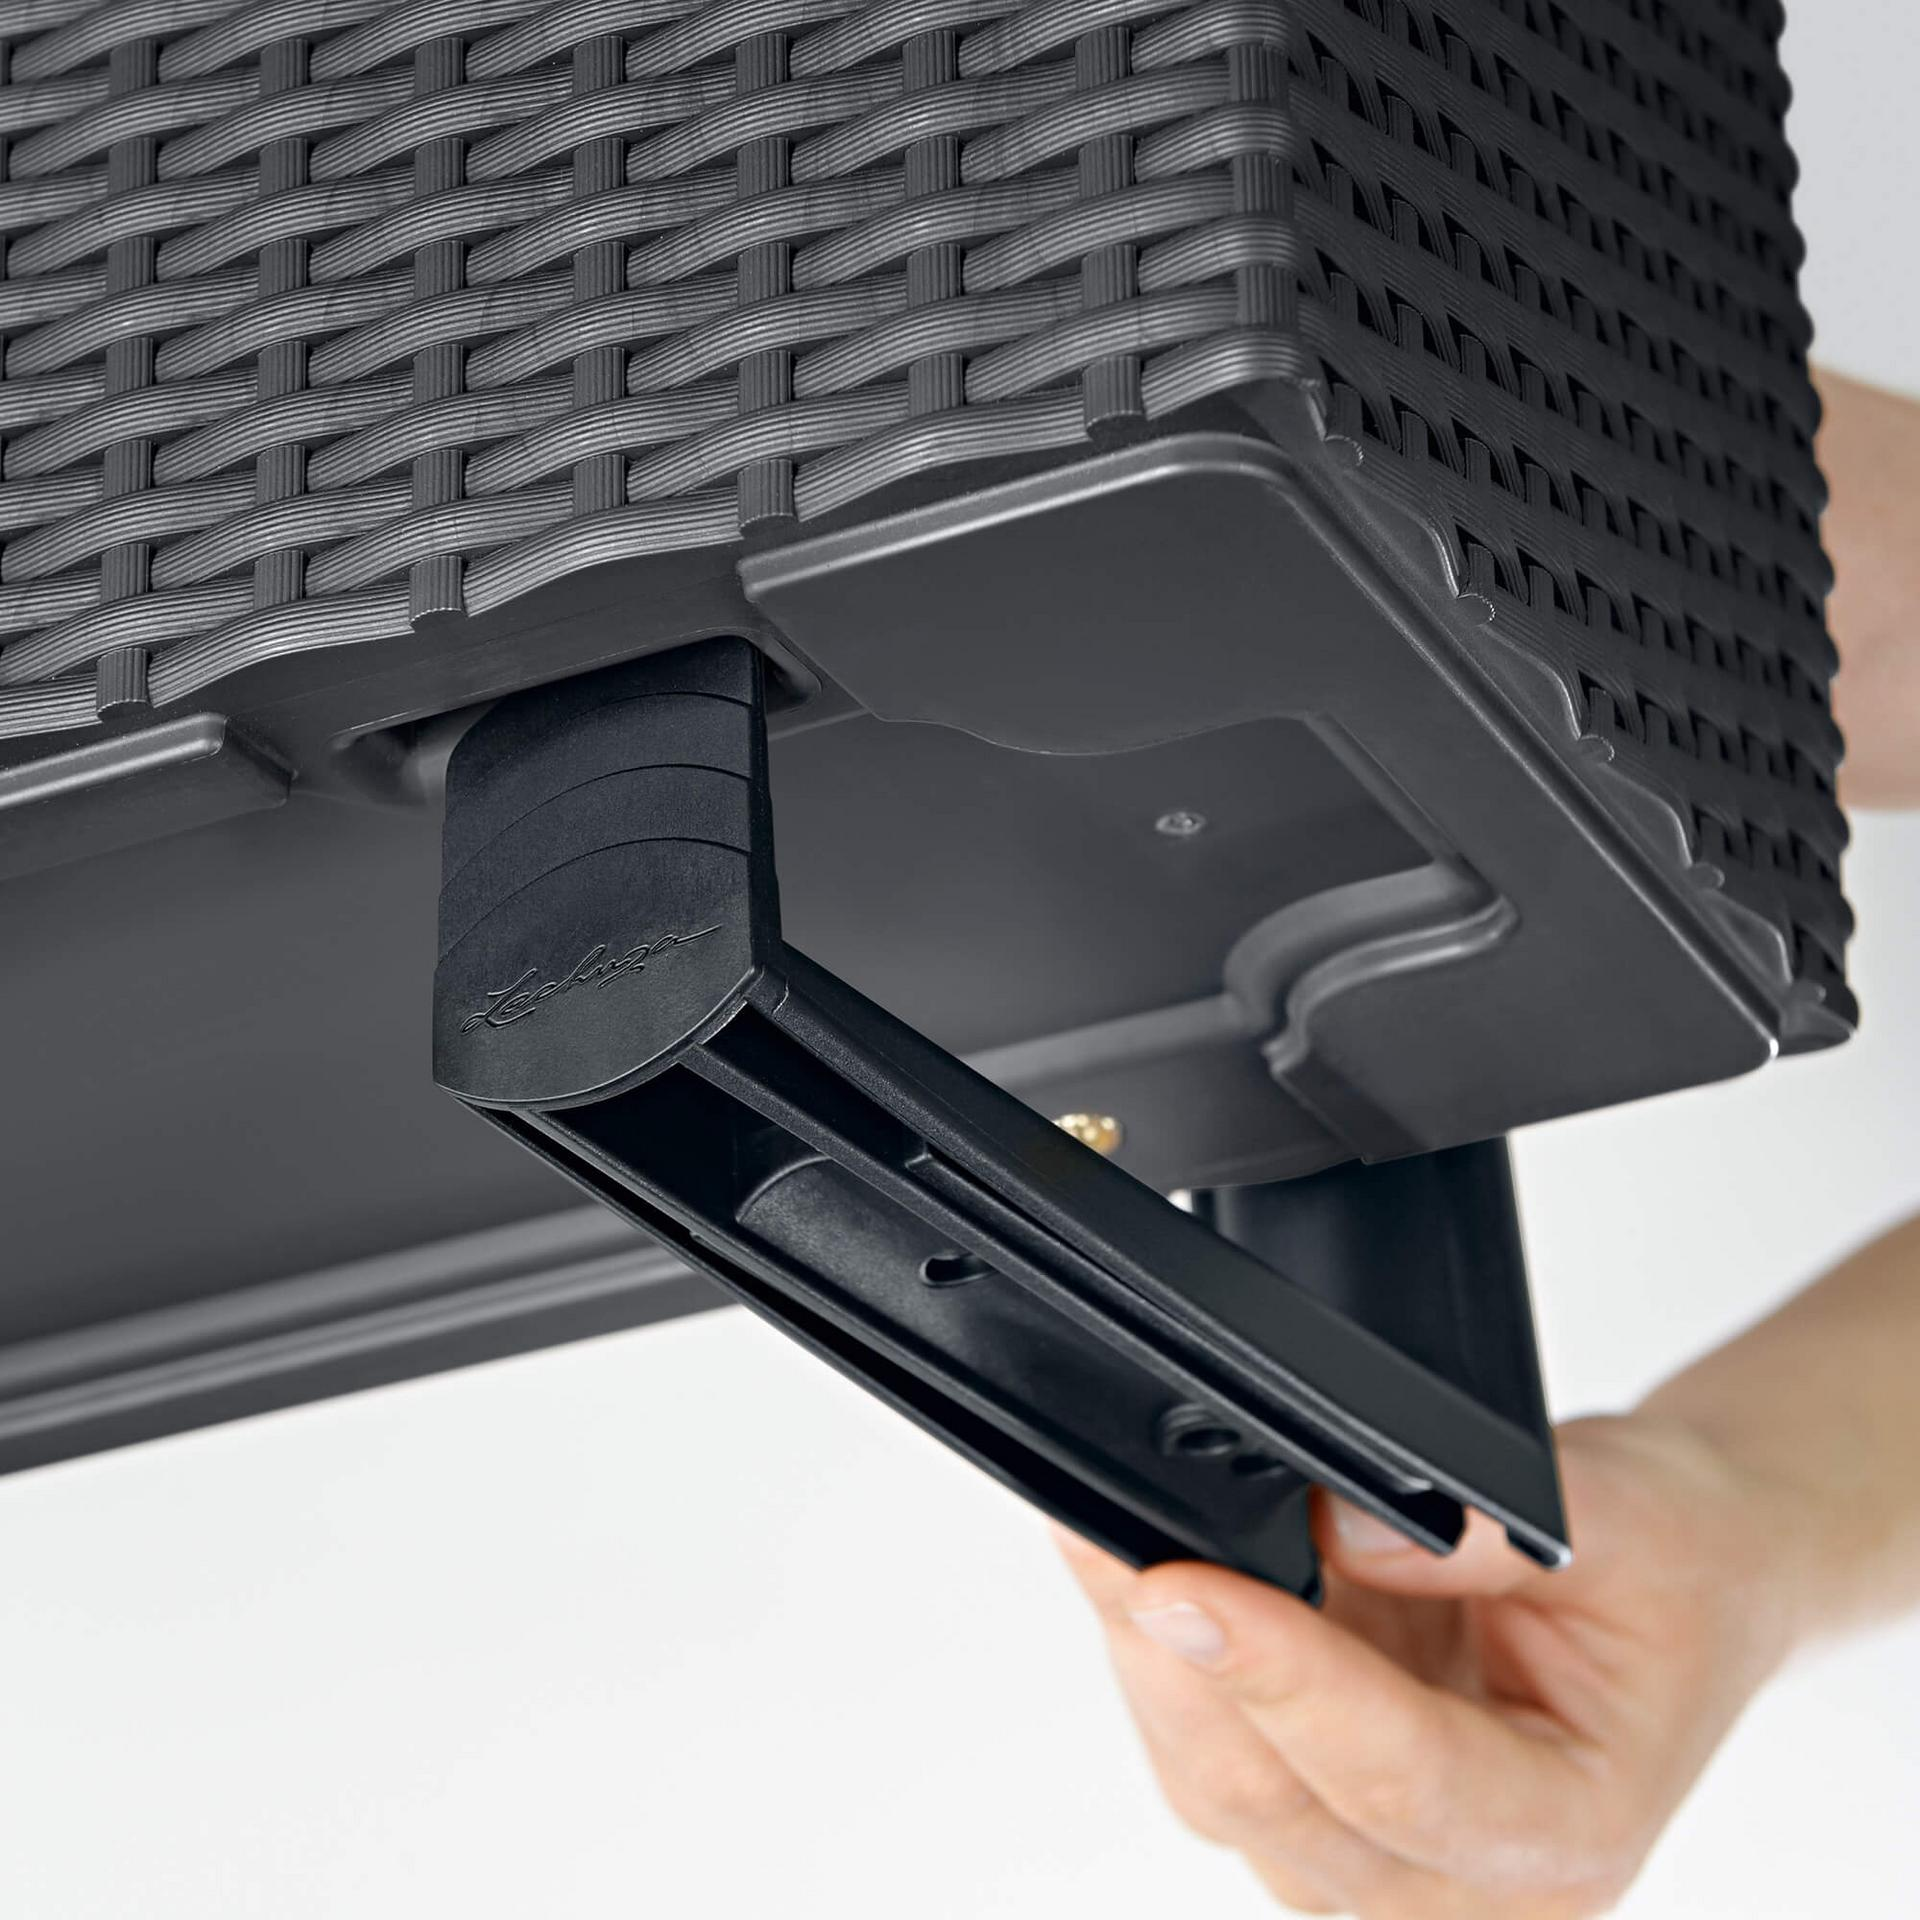 lechuza balkonkastenhalter schwarz. Black Bedroom Furniture Sets. Home Design Ideas